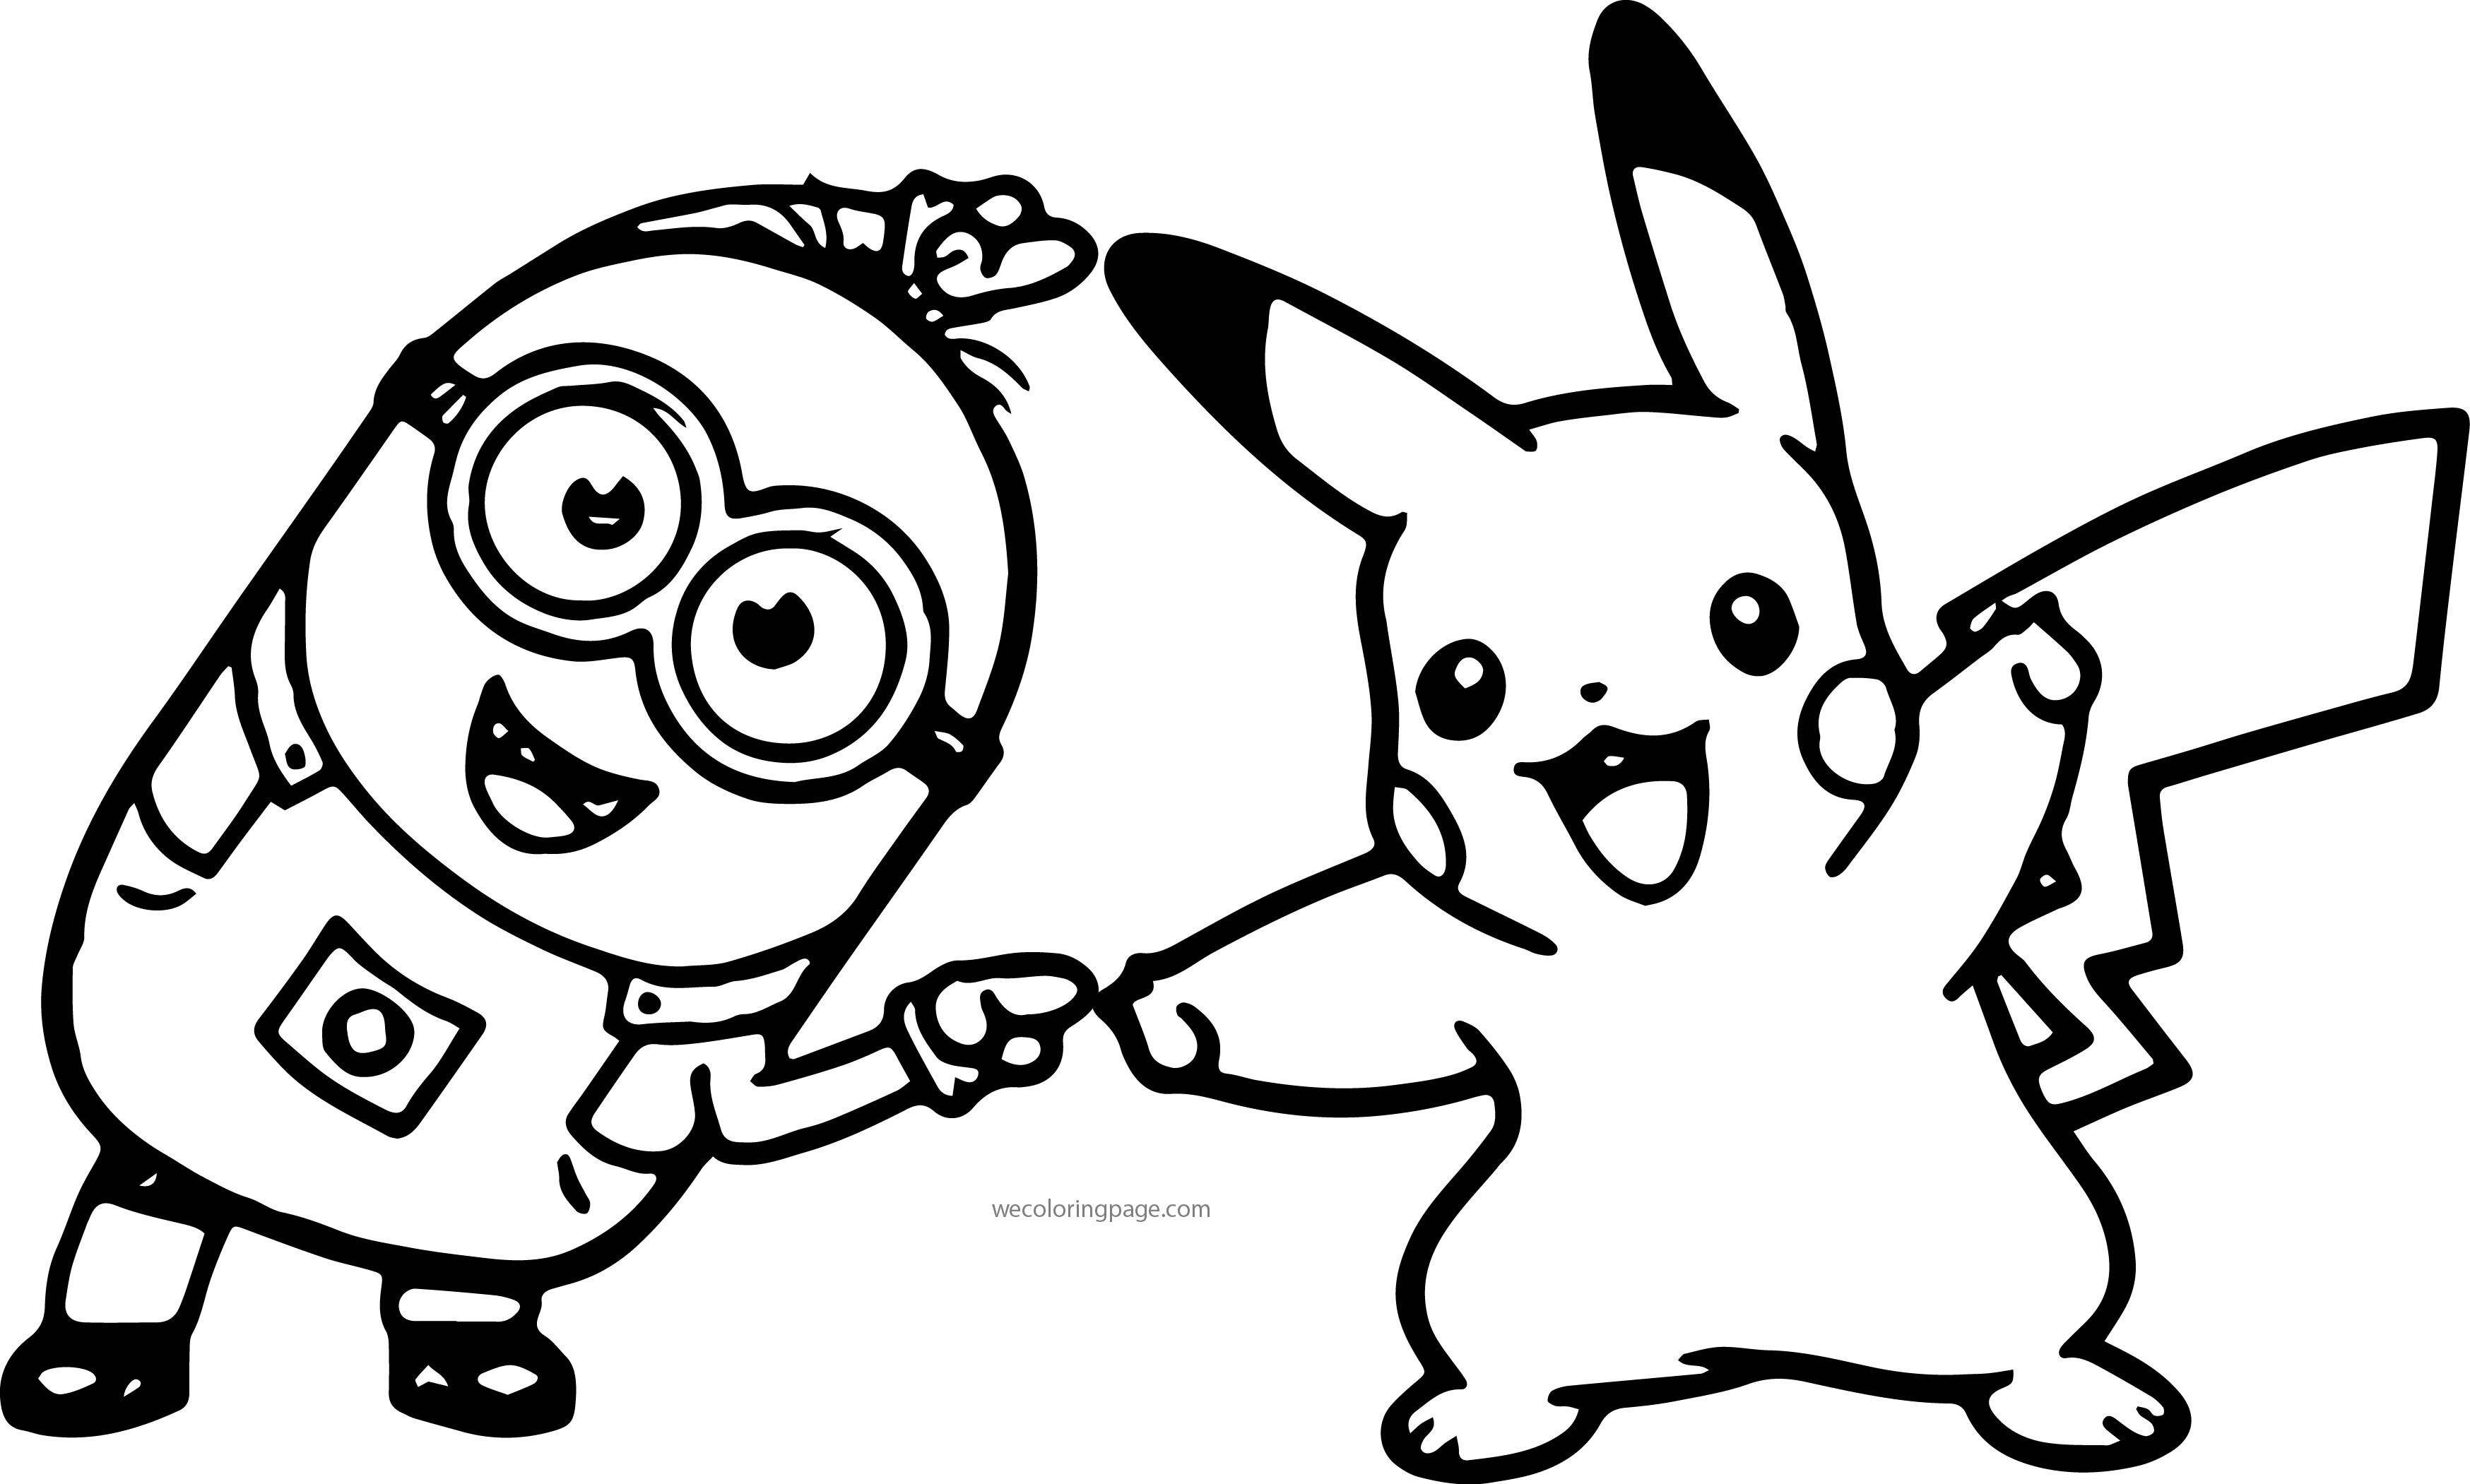 Free Printable Pokemon Coloring Pages Minion Pikachu Dance Pokemon Coloring Page Wecoloringpage Entitlementtrap Com Minion Coloring Pages Pikachu Coloring Page Minions Coloring Pages